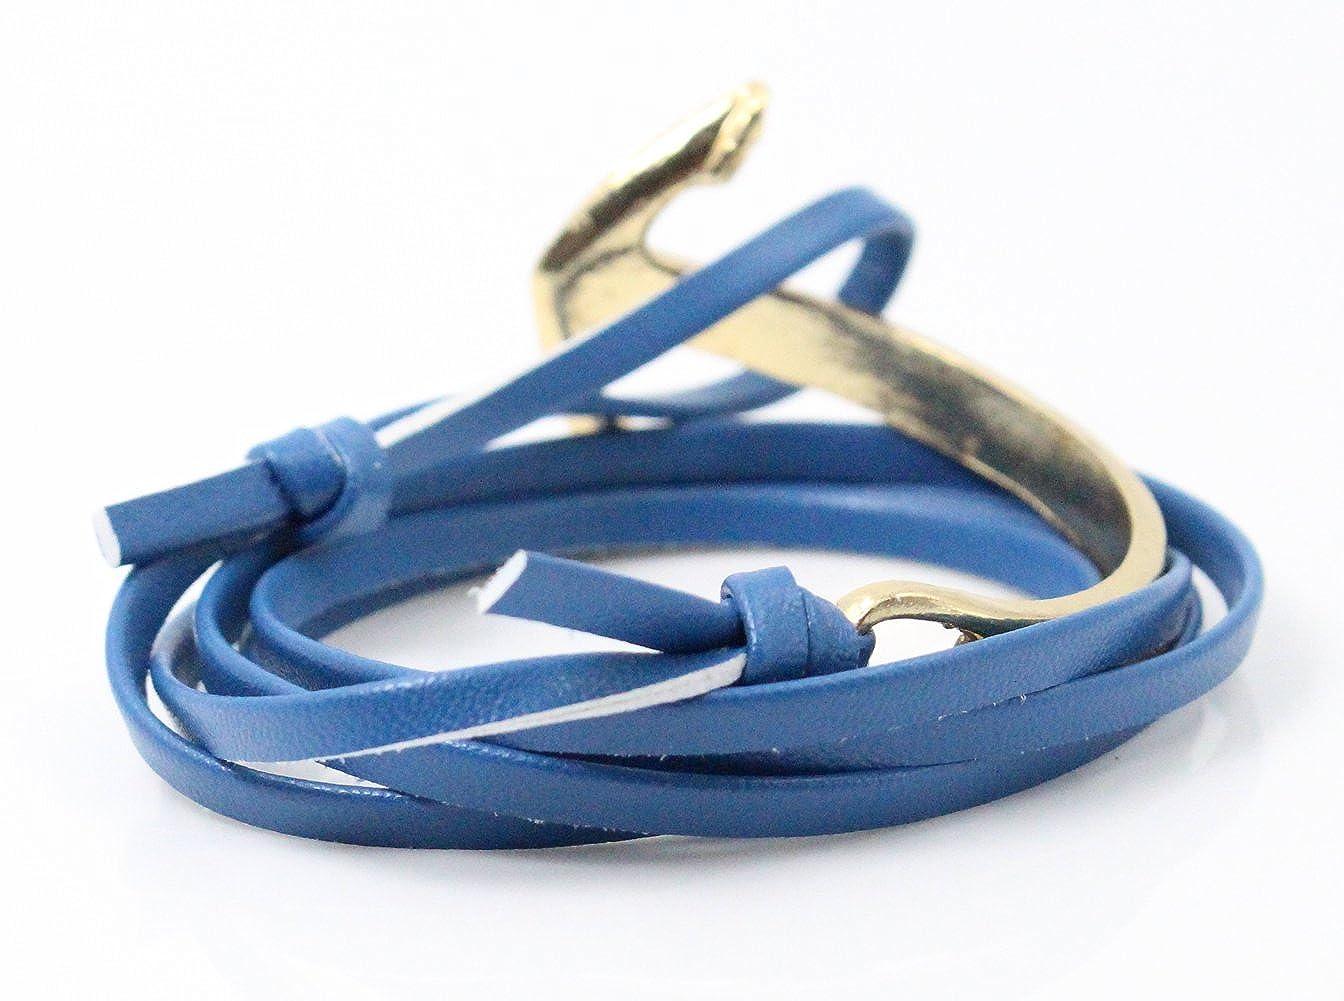 Golastartery Punk Alloy Anchor Bracelet Hand Leather Cuff Bracelet